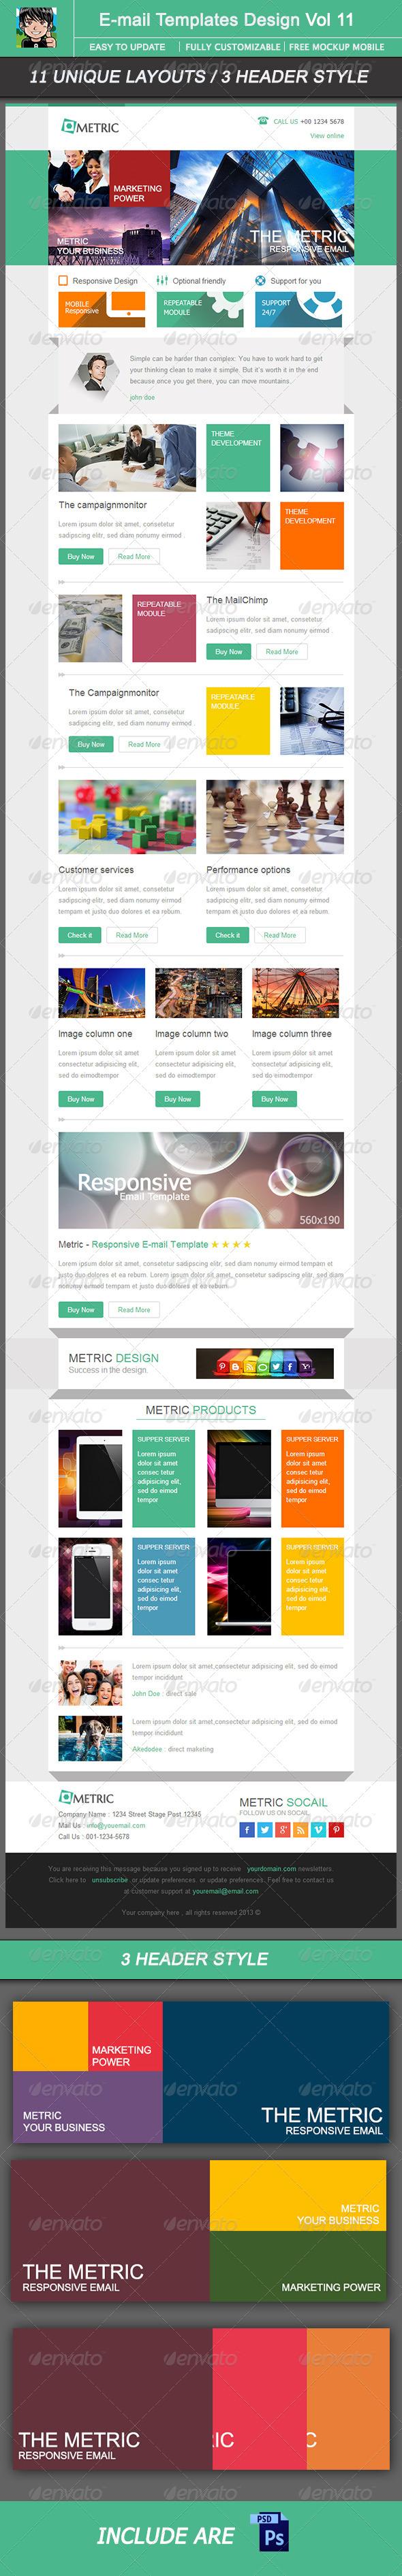 Metric-Email Template Design Vol 11